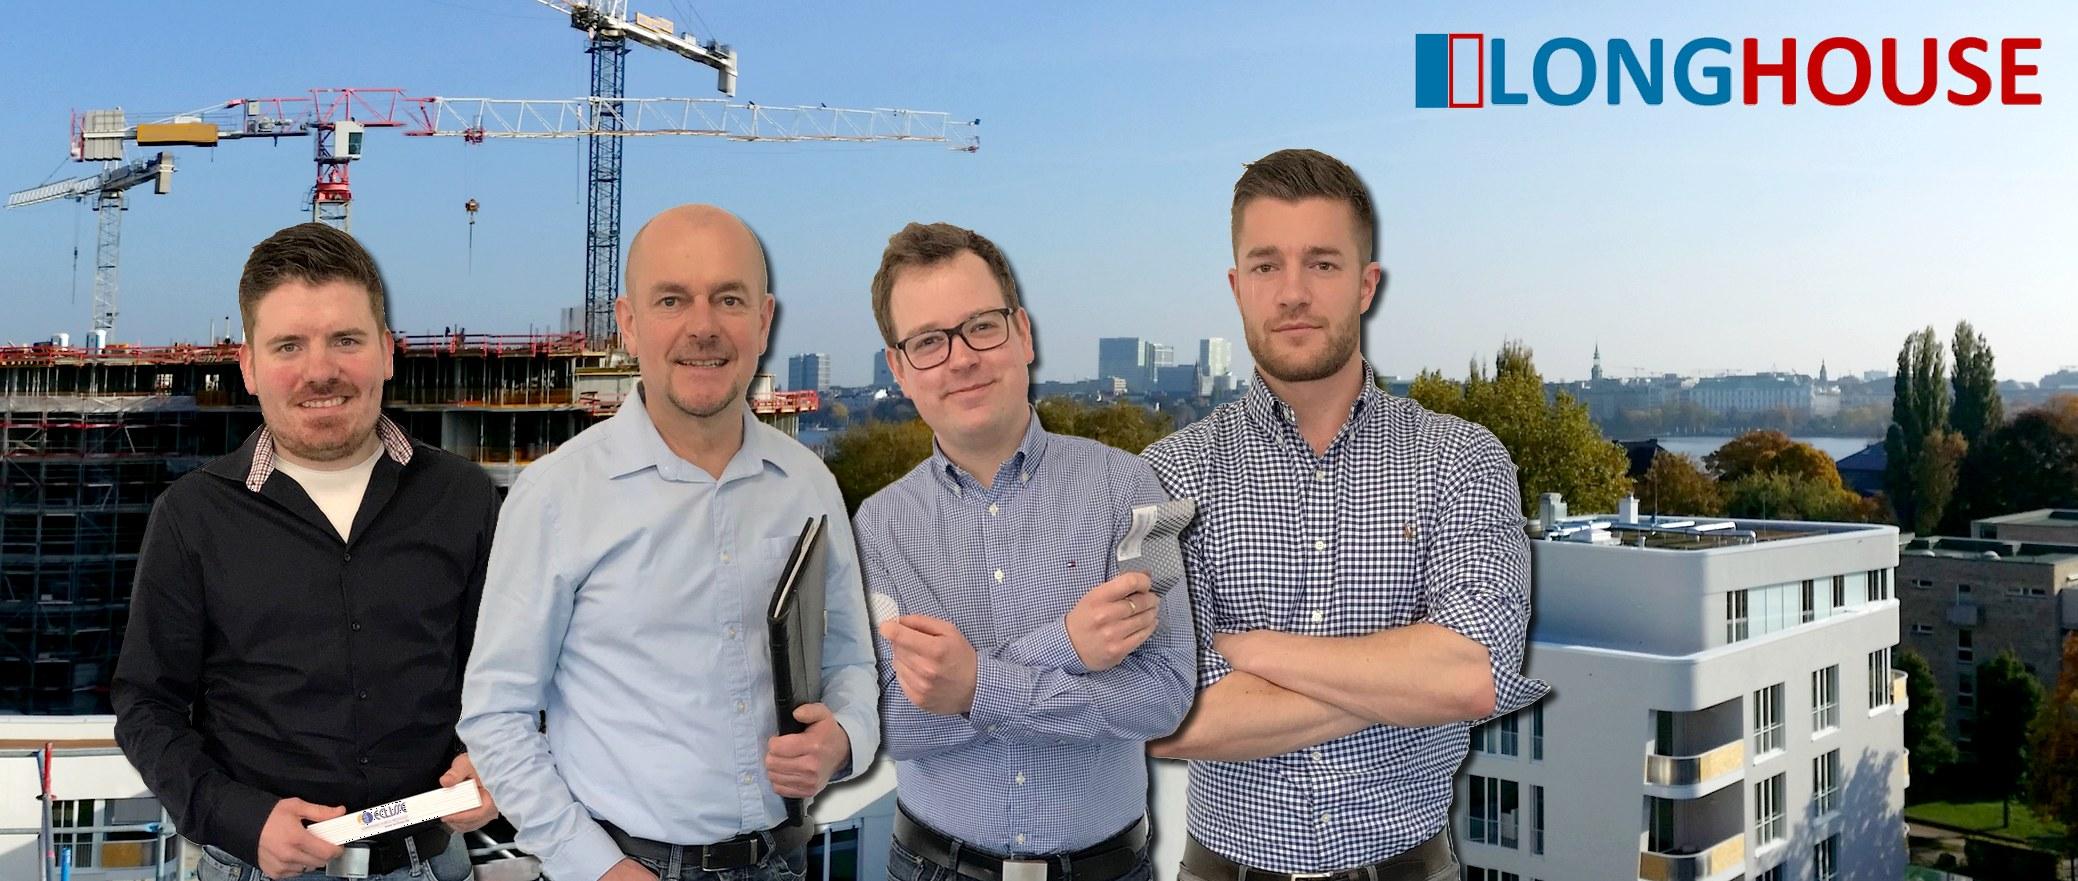 Longhouse GmbH - Mitarbeiter - Über uns